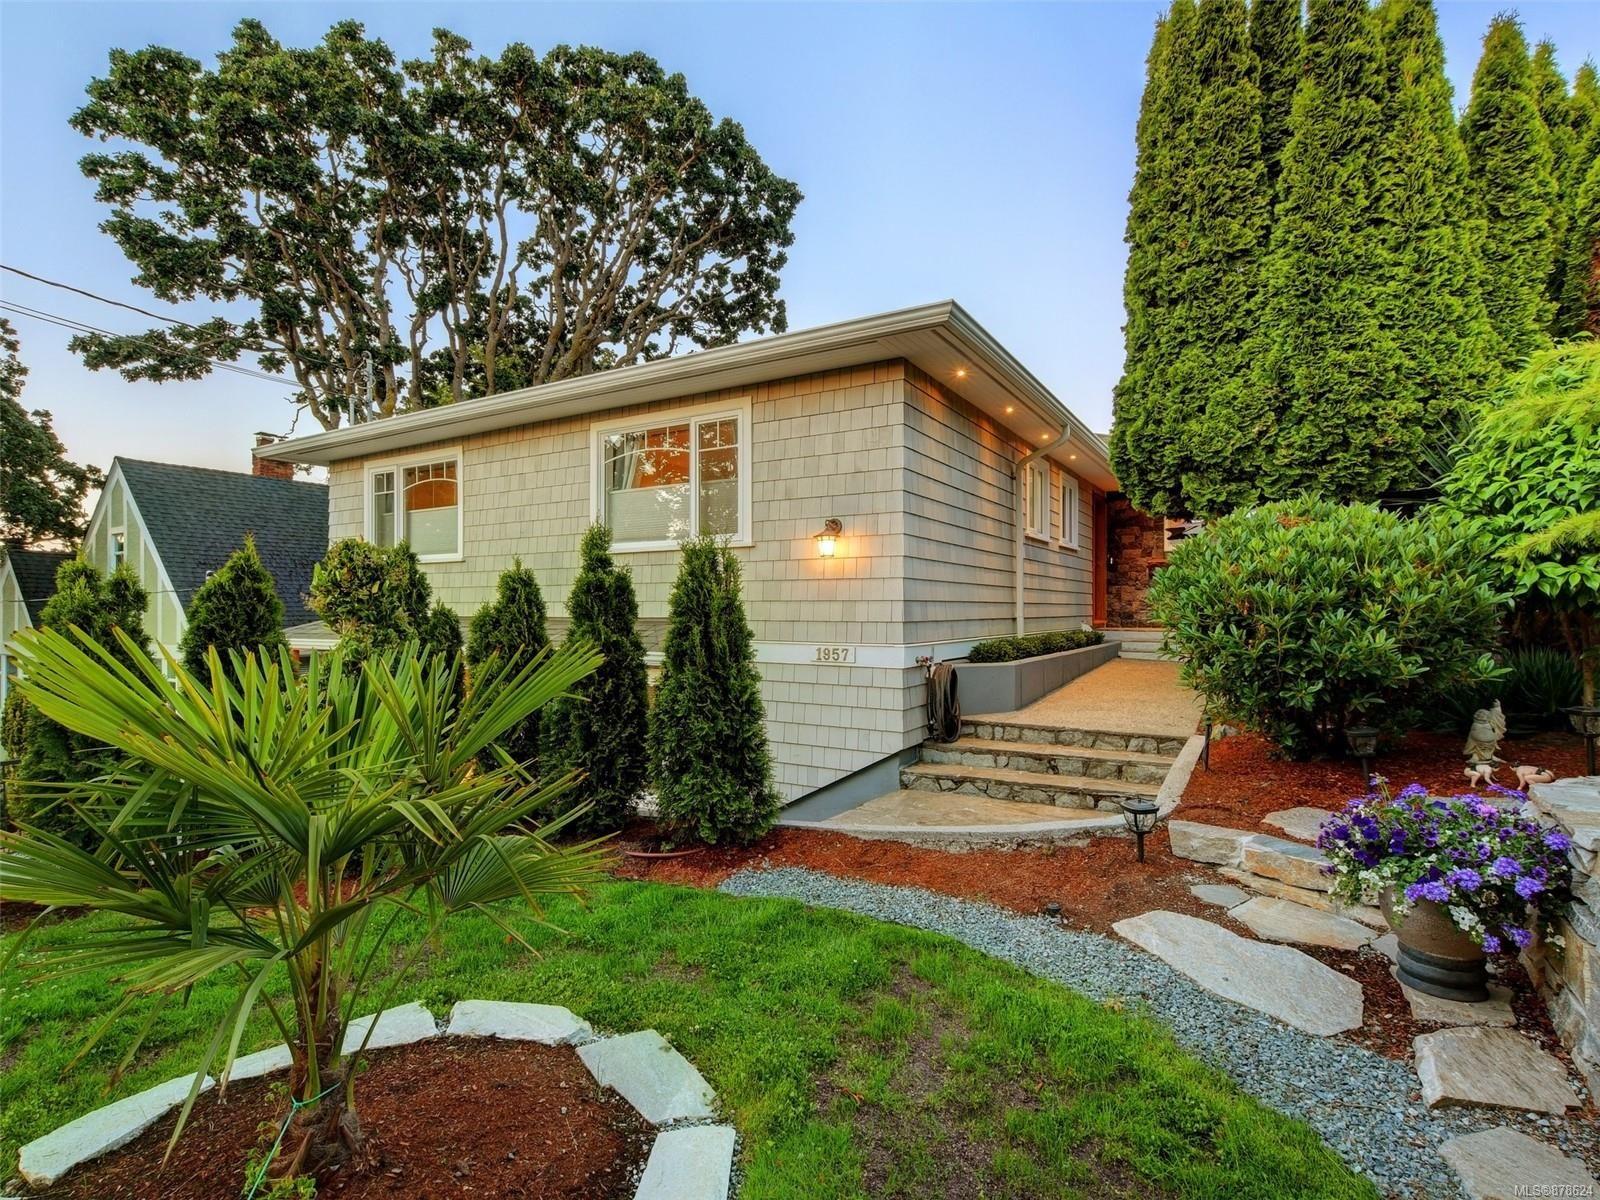 Main Photo: 1957 Hampshire Rd in : OB North Oak Bay House for sale (Oak Bay)  : MLS®# 878624